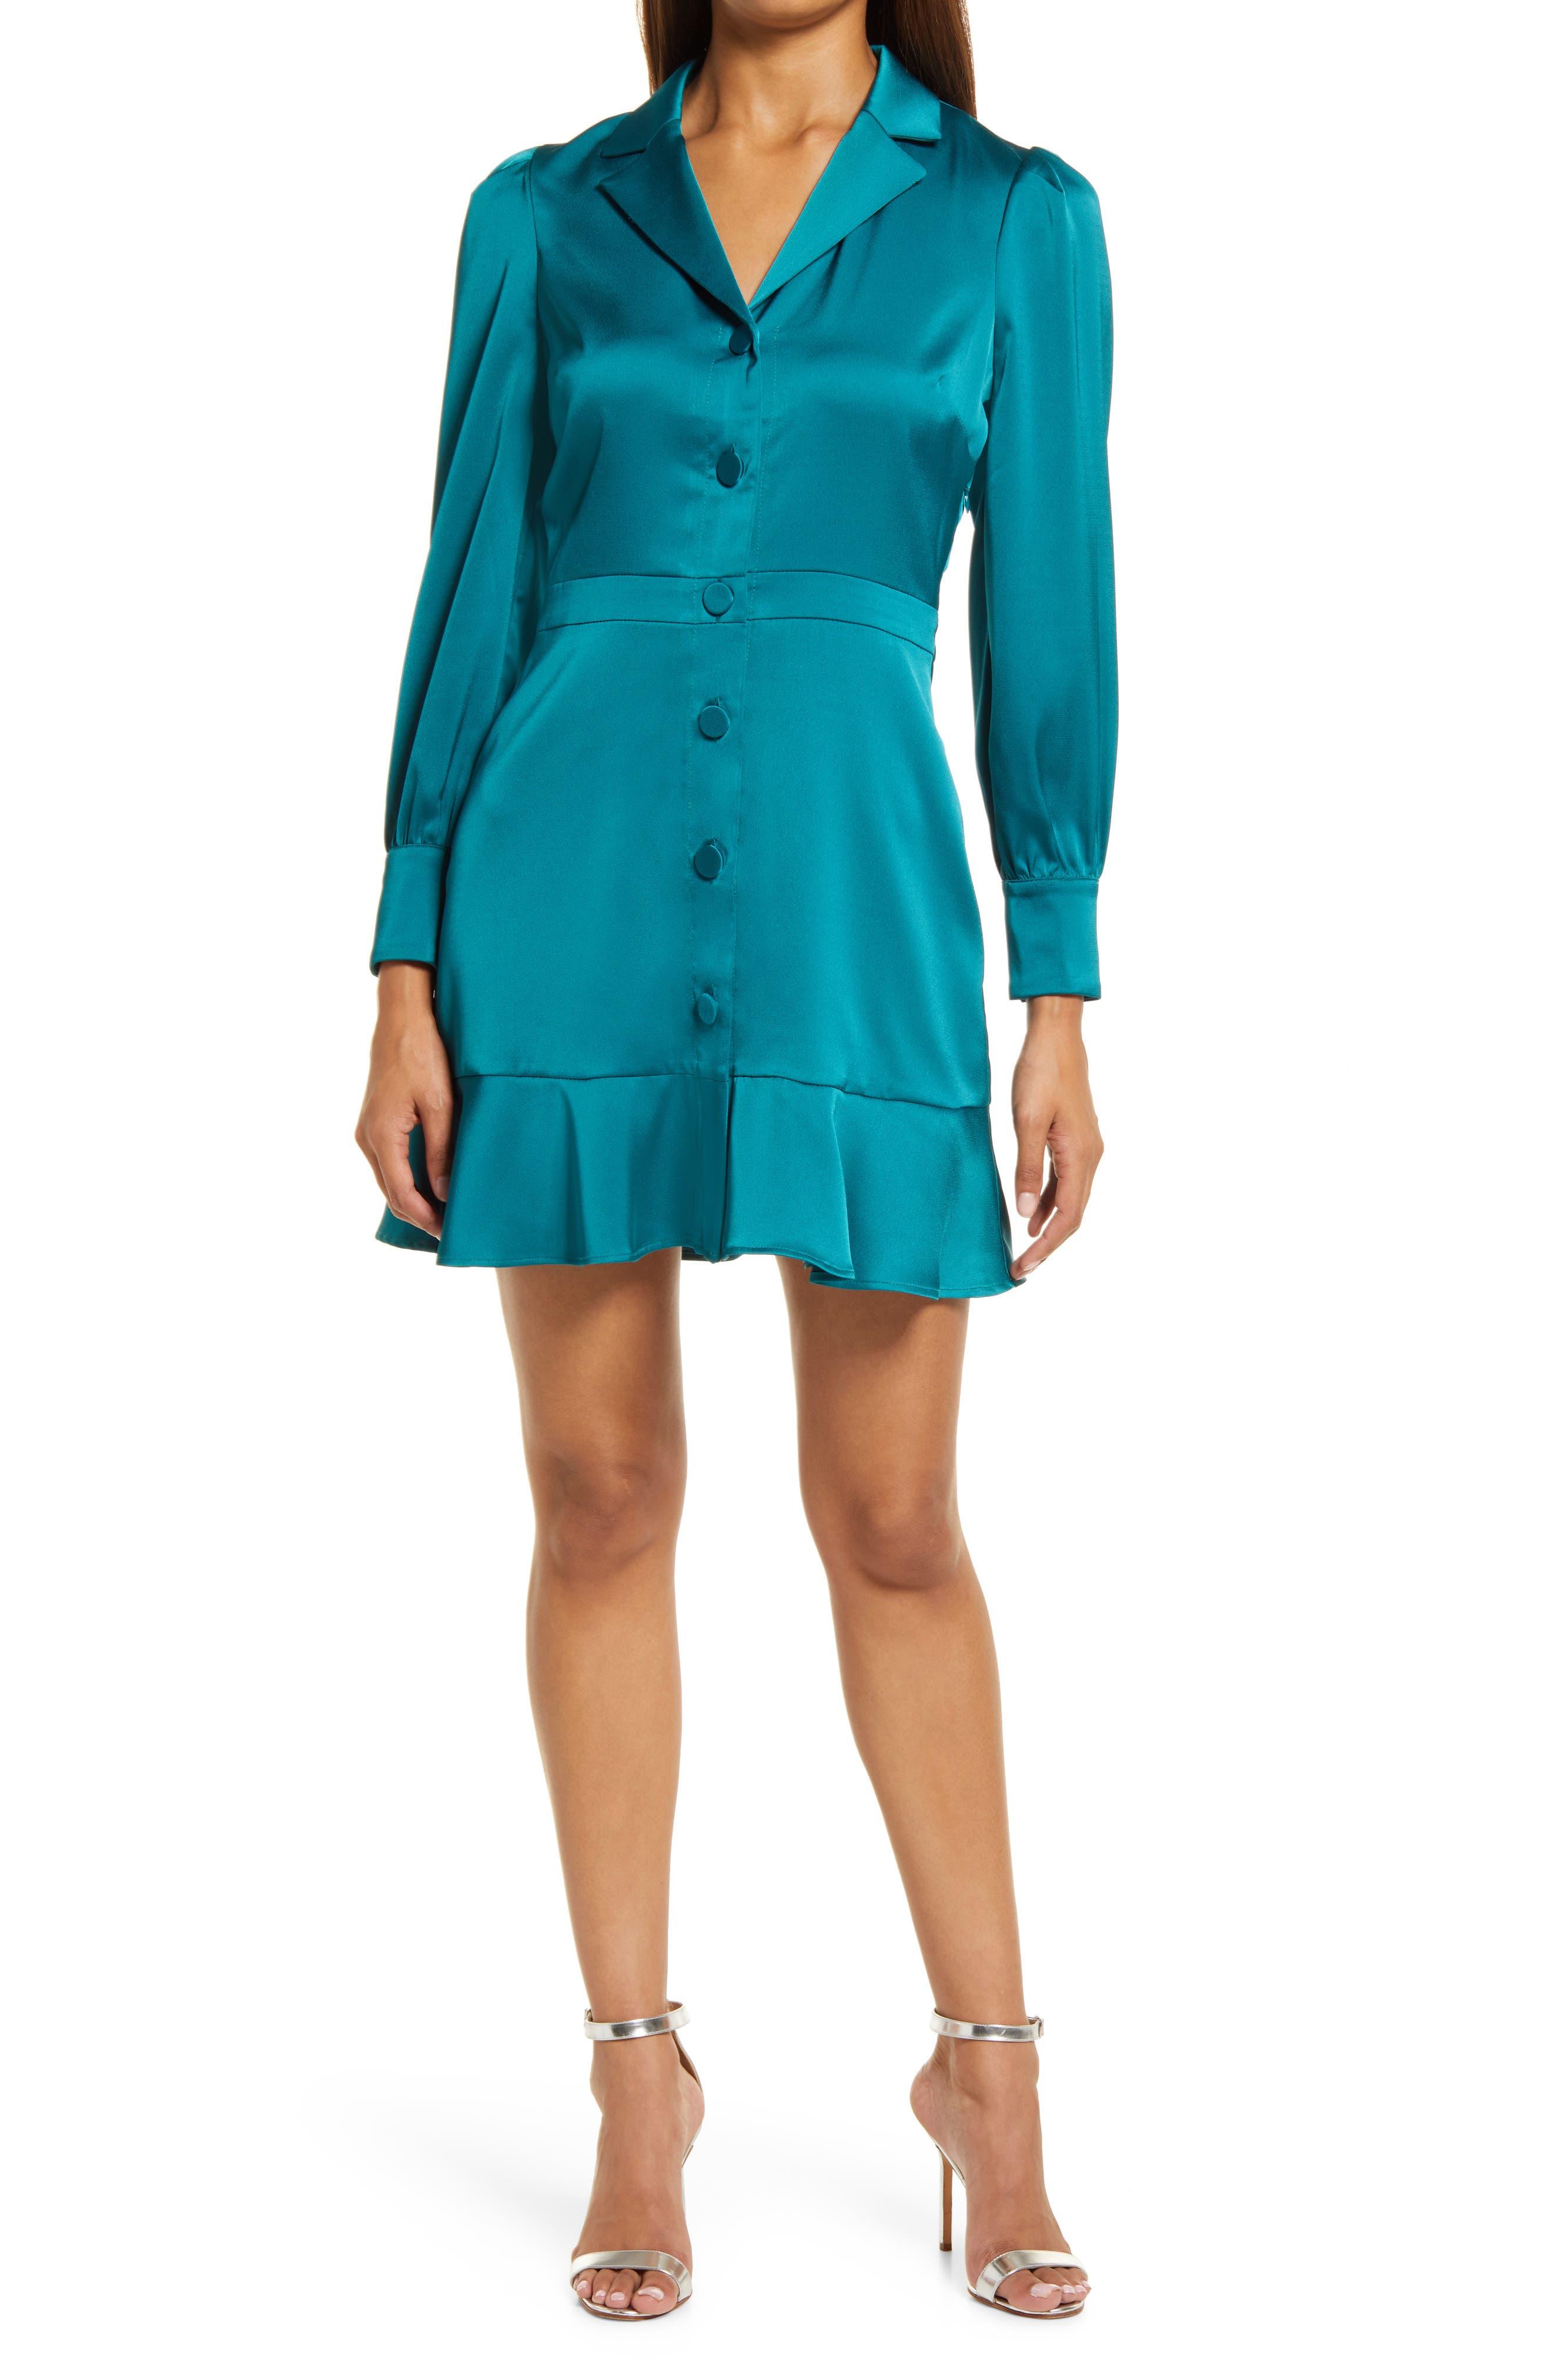 Patricia Long Sleeve Sateen Fit & Flare Minidress